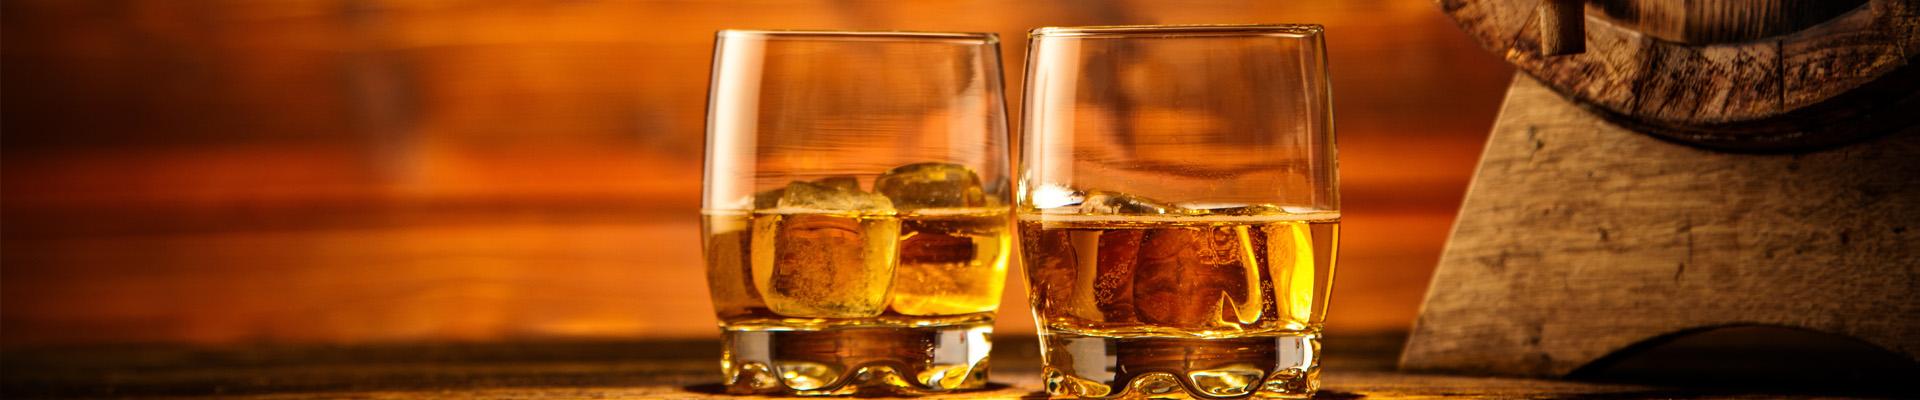 Beverage Distillery - Distillers Grains